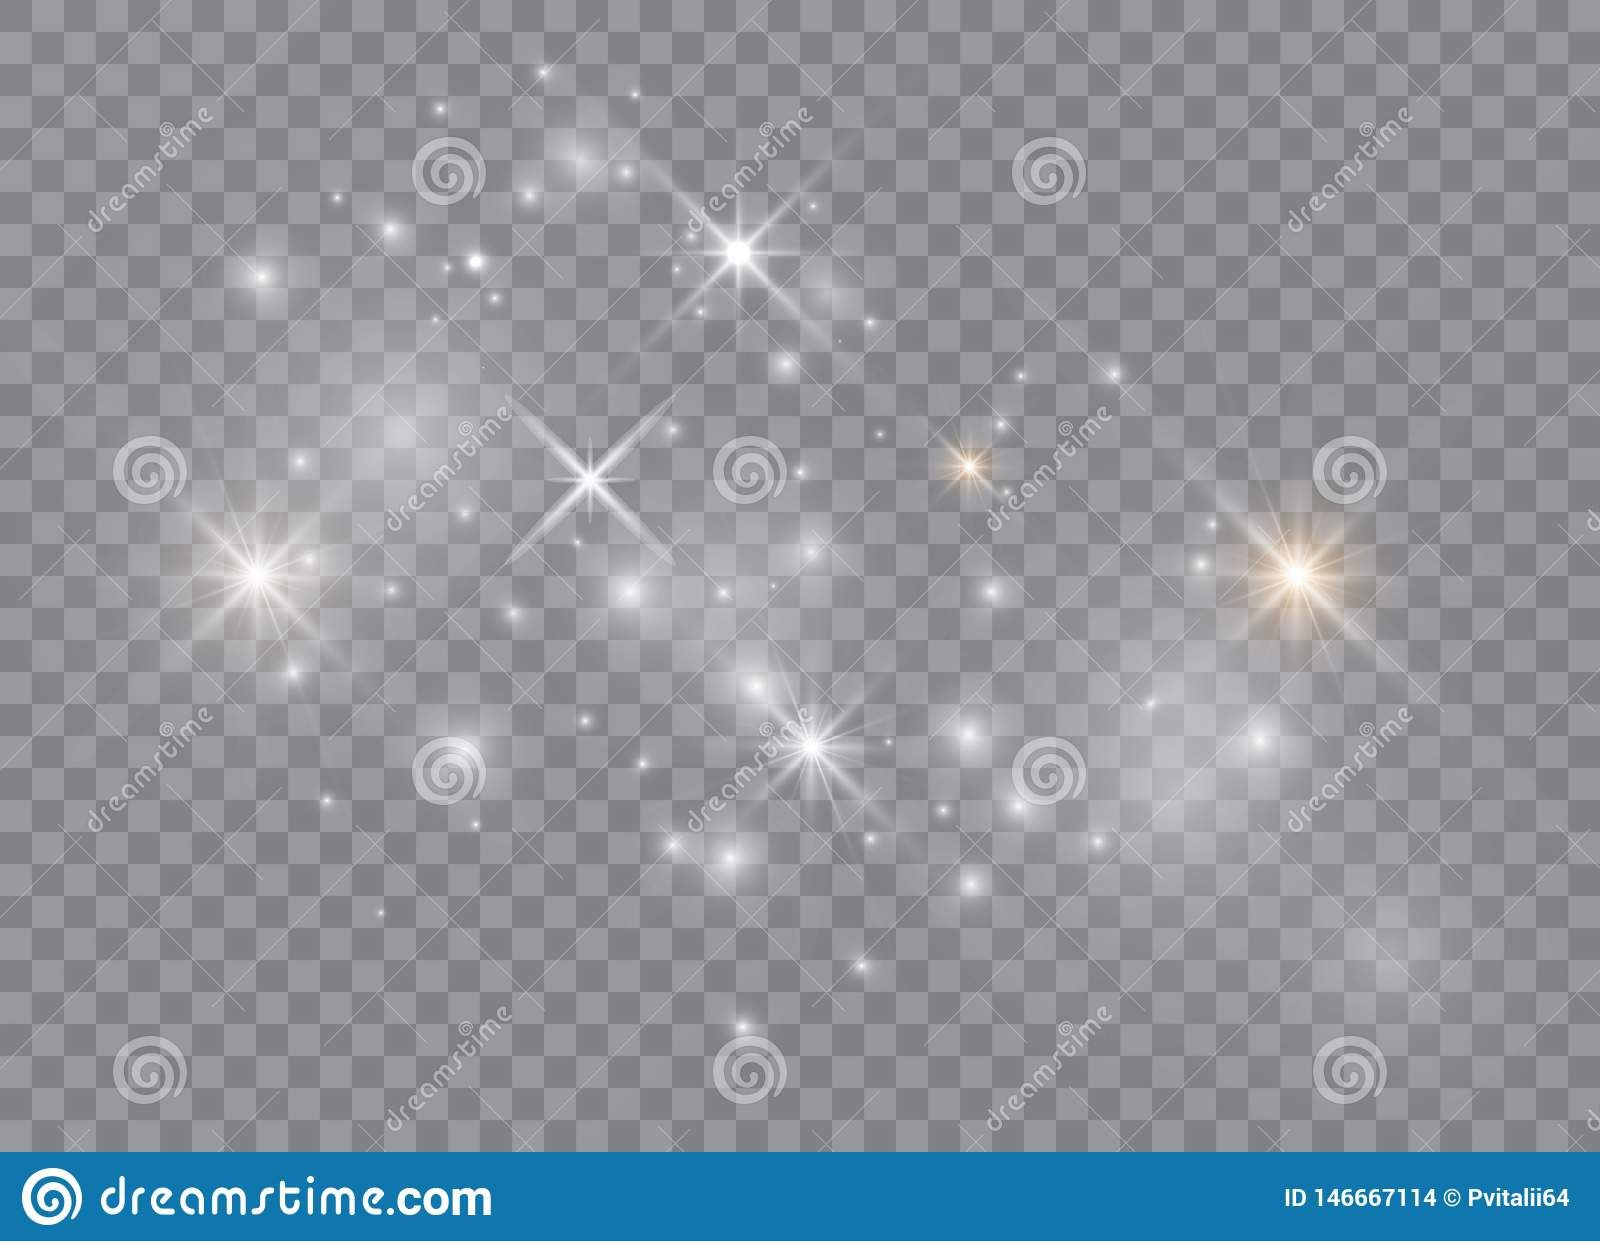 Illustration About White Sparks Glitter Special Light Effect Vector Sparkles On Transparent Background Sparkling Transparent Background Light Effect Sparkle